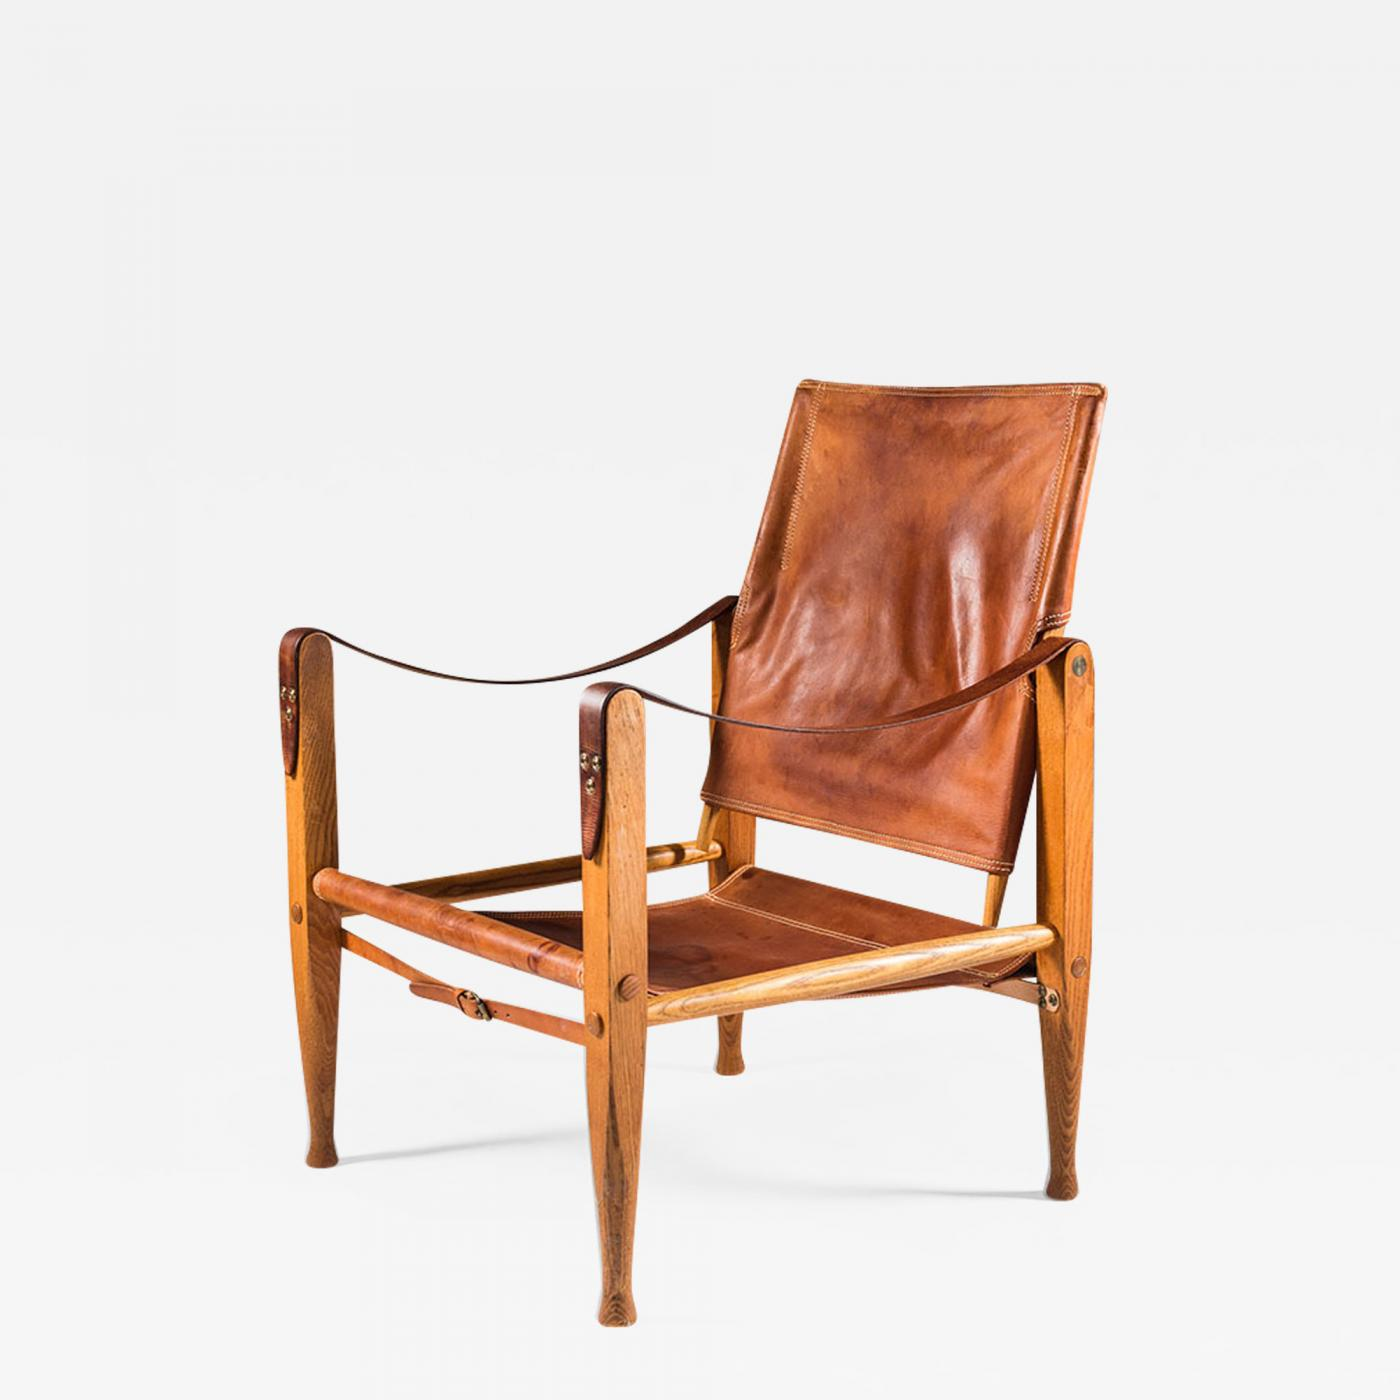 Strange Kaare Klint Edvard Kindt Larsen Scandinavian Mid Century Safari Chair By Kaare Klindt In Cognac Leather Gamerscity Chair Design For Home Gamerscityorg